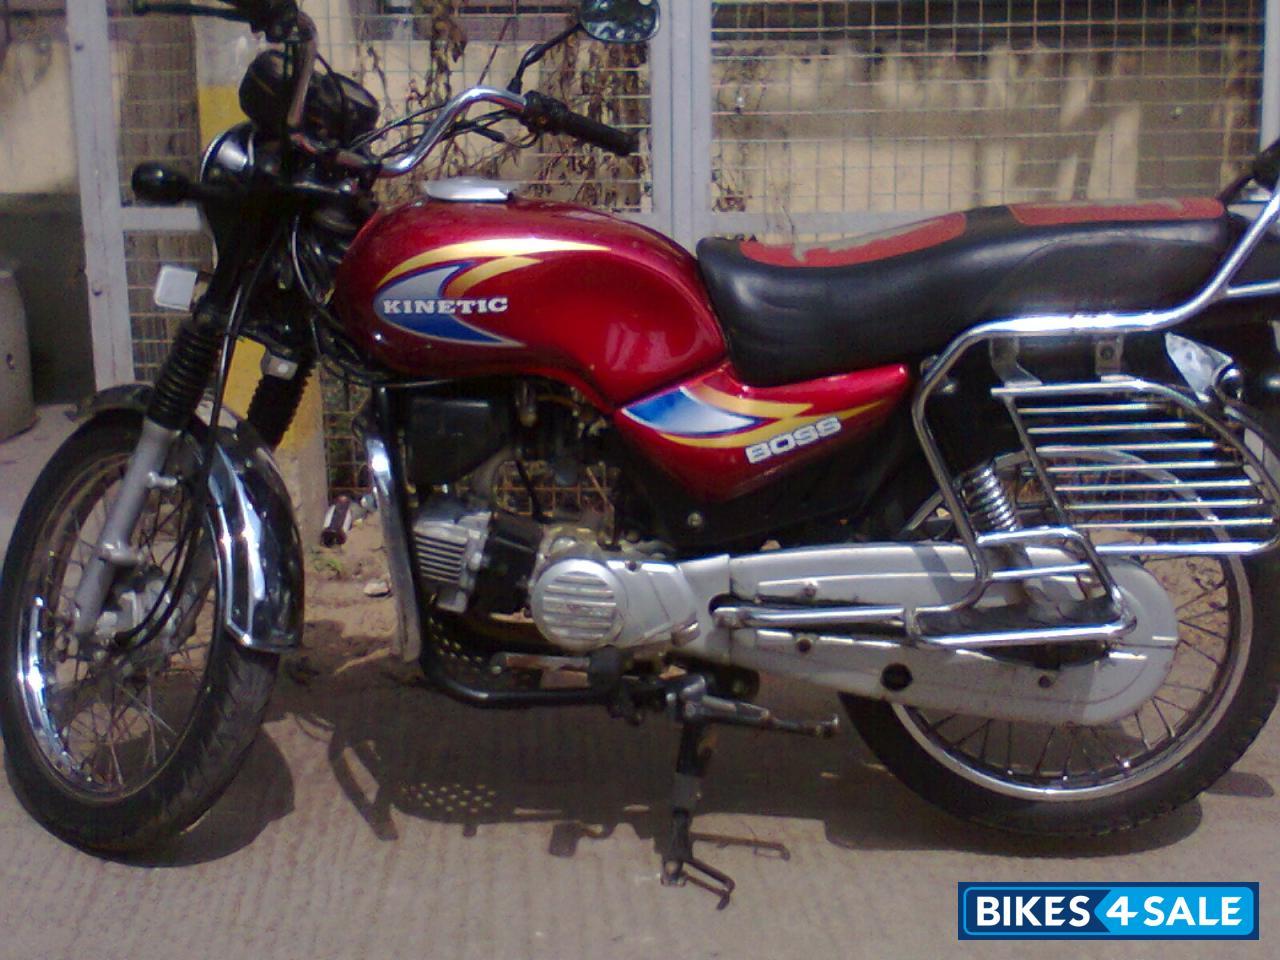 f25e4785853 Wine Red Kinetic Boss 115 Picture 1. Bike ID 70960. Bike located in ...